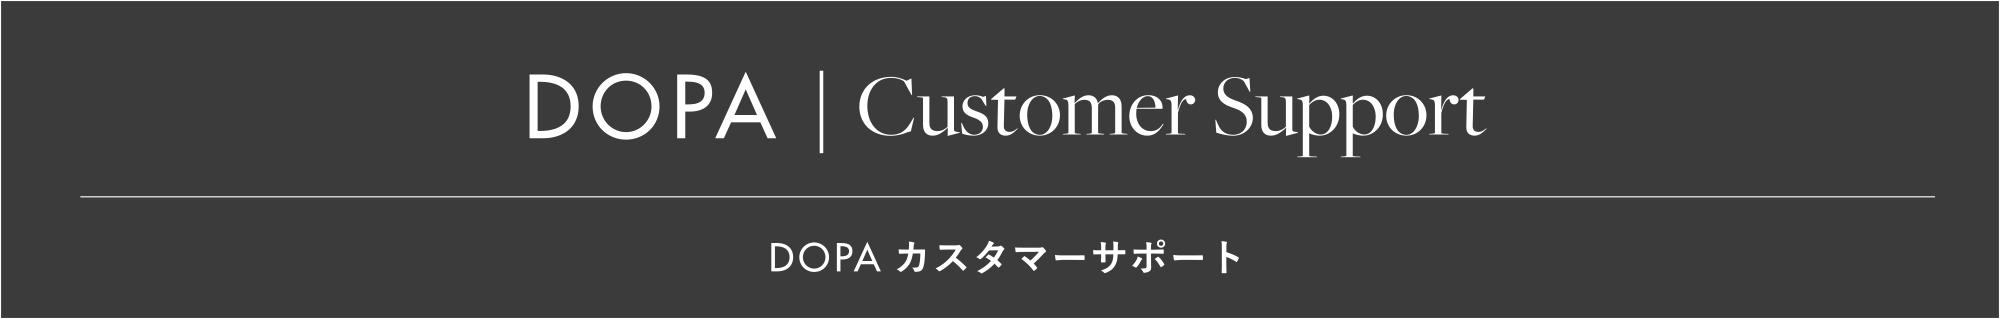 DOPA | Customer Support